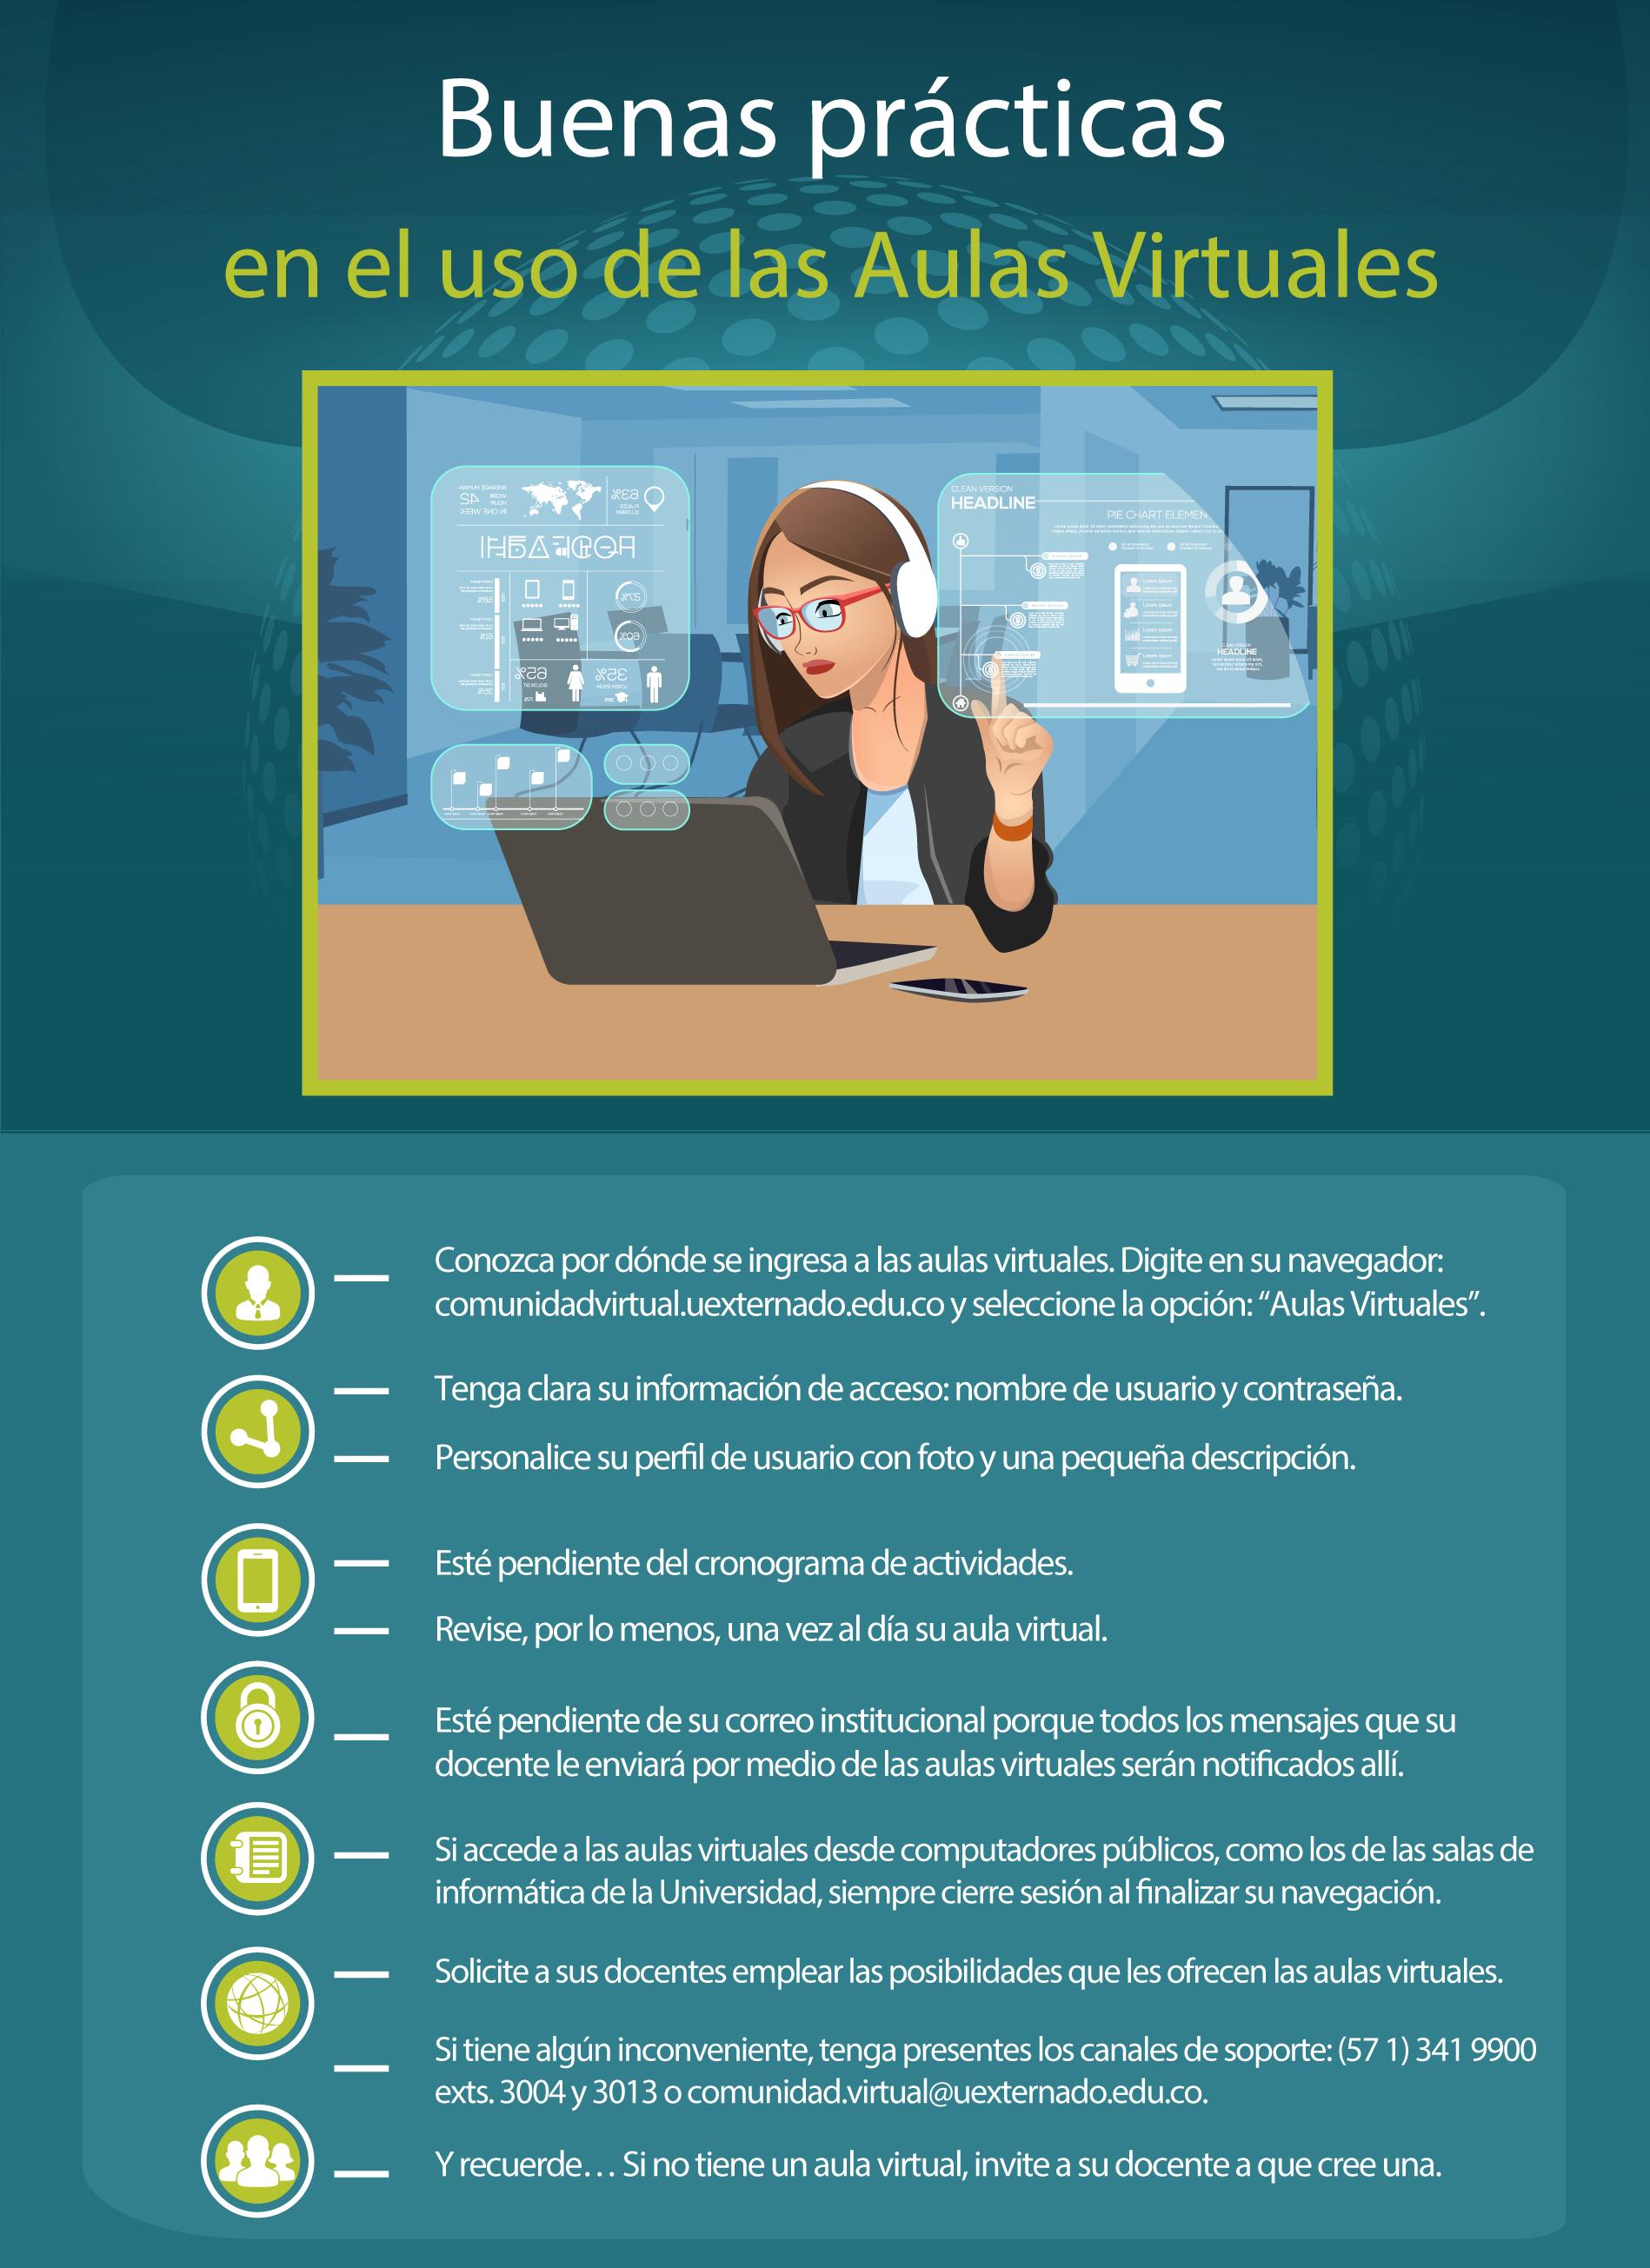 infografia_buenaspracticasaulasvirtuales